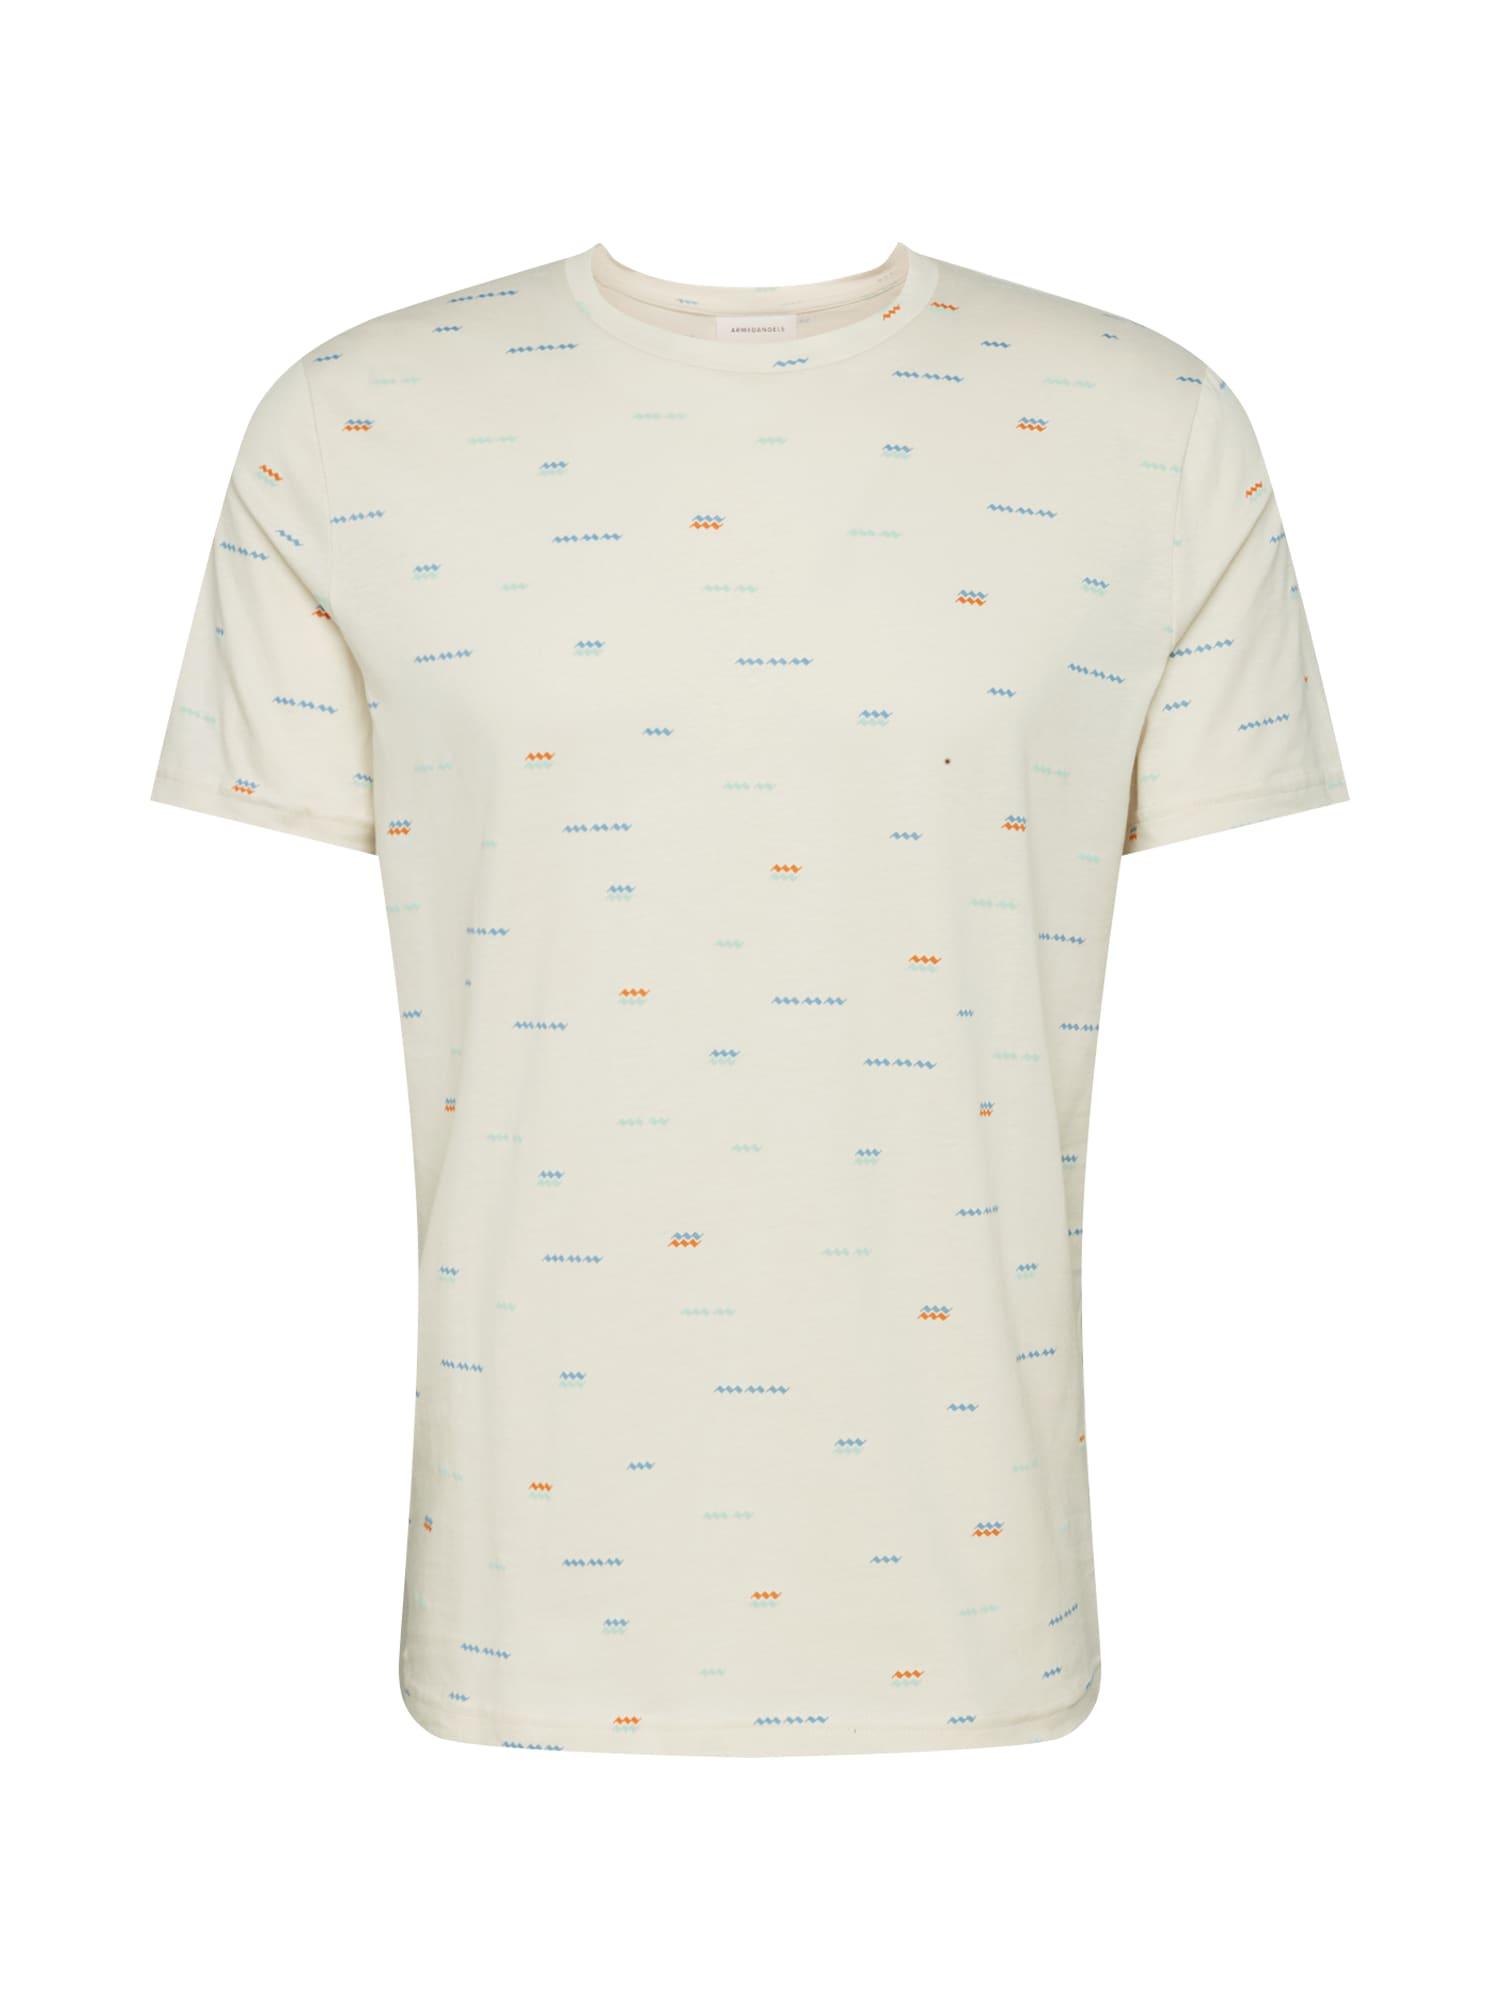 ARMEDANGELS Marškinėliai 'JAAMES WAVES' mišrios spalvos / balta